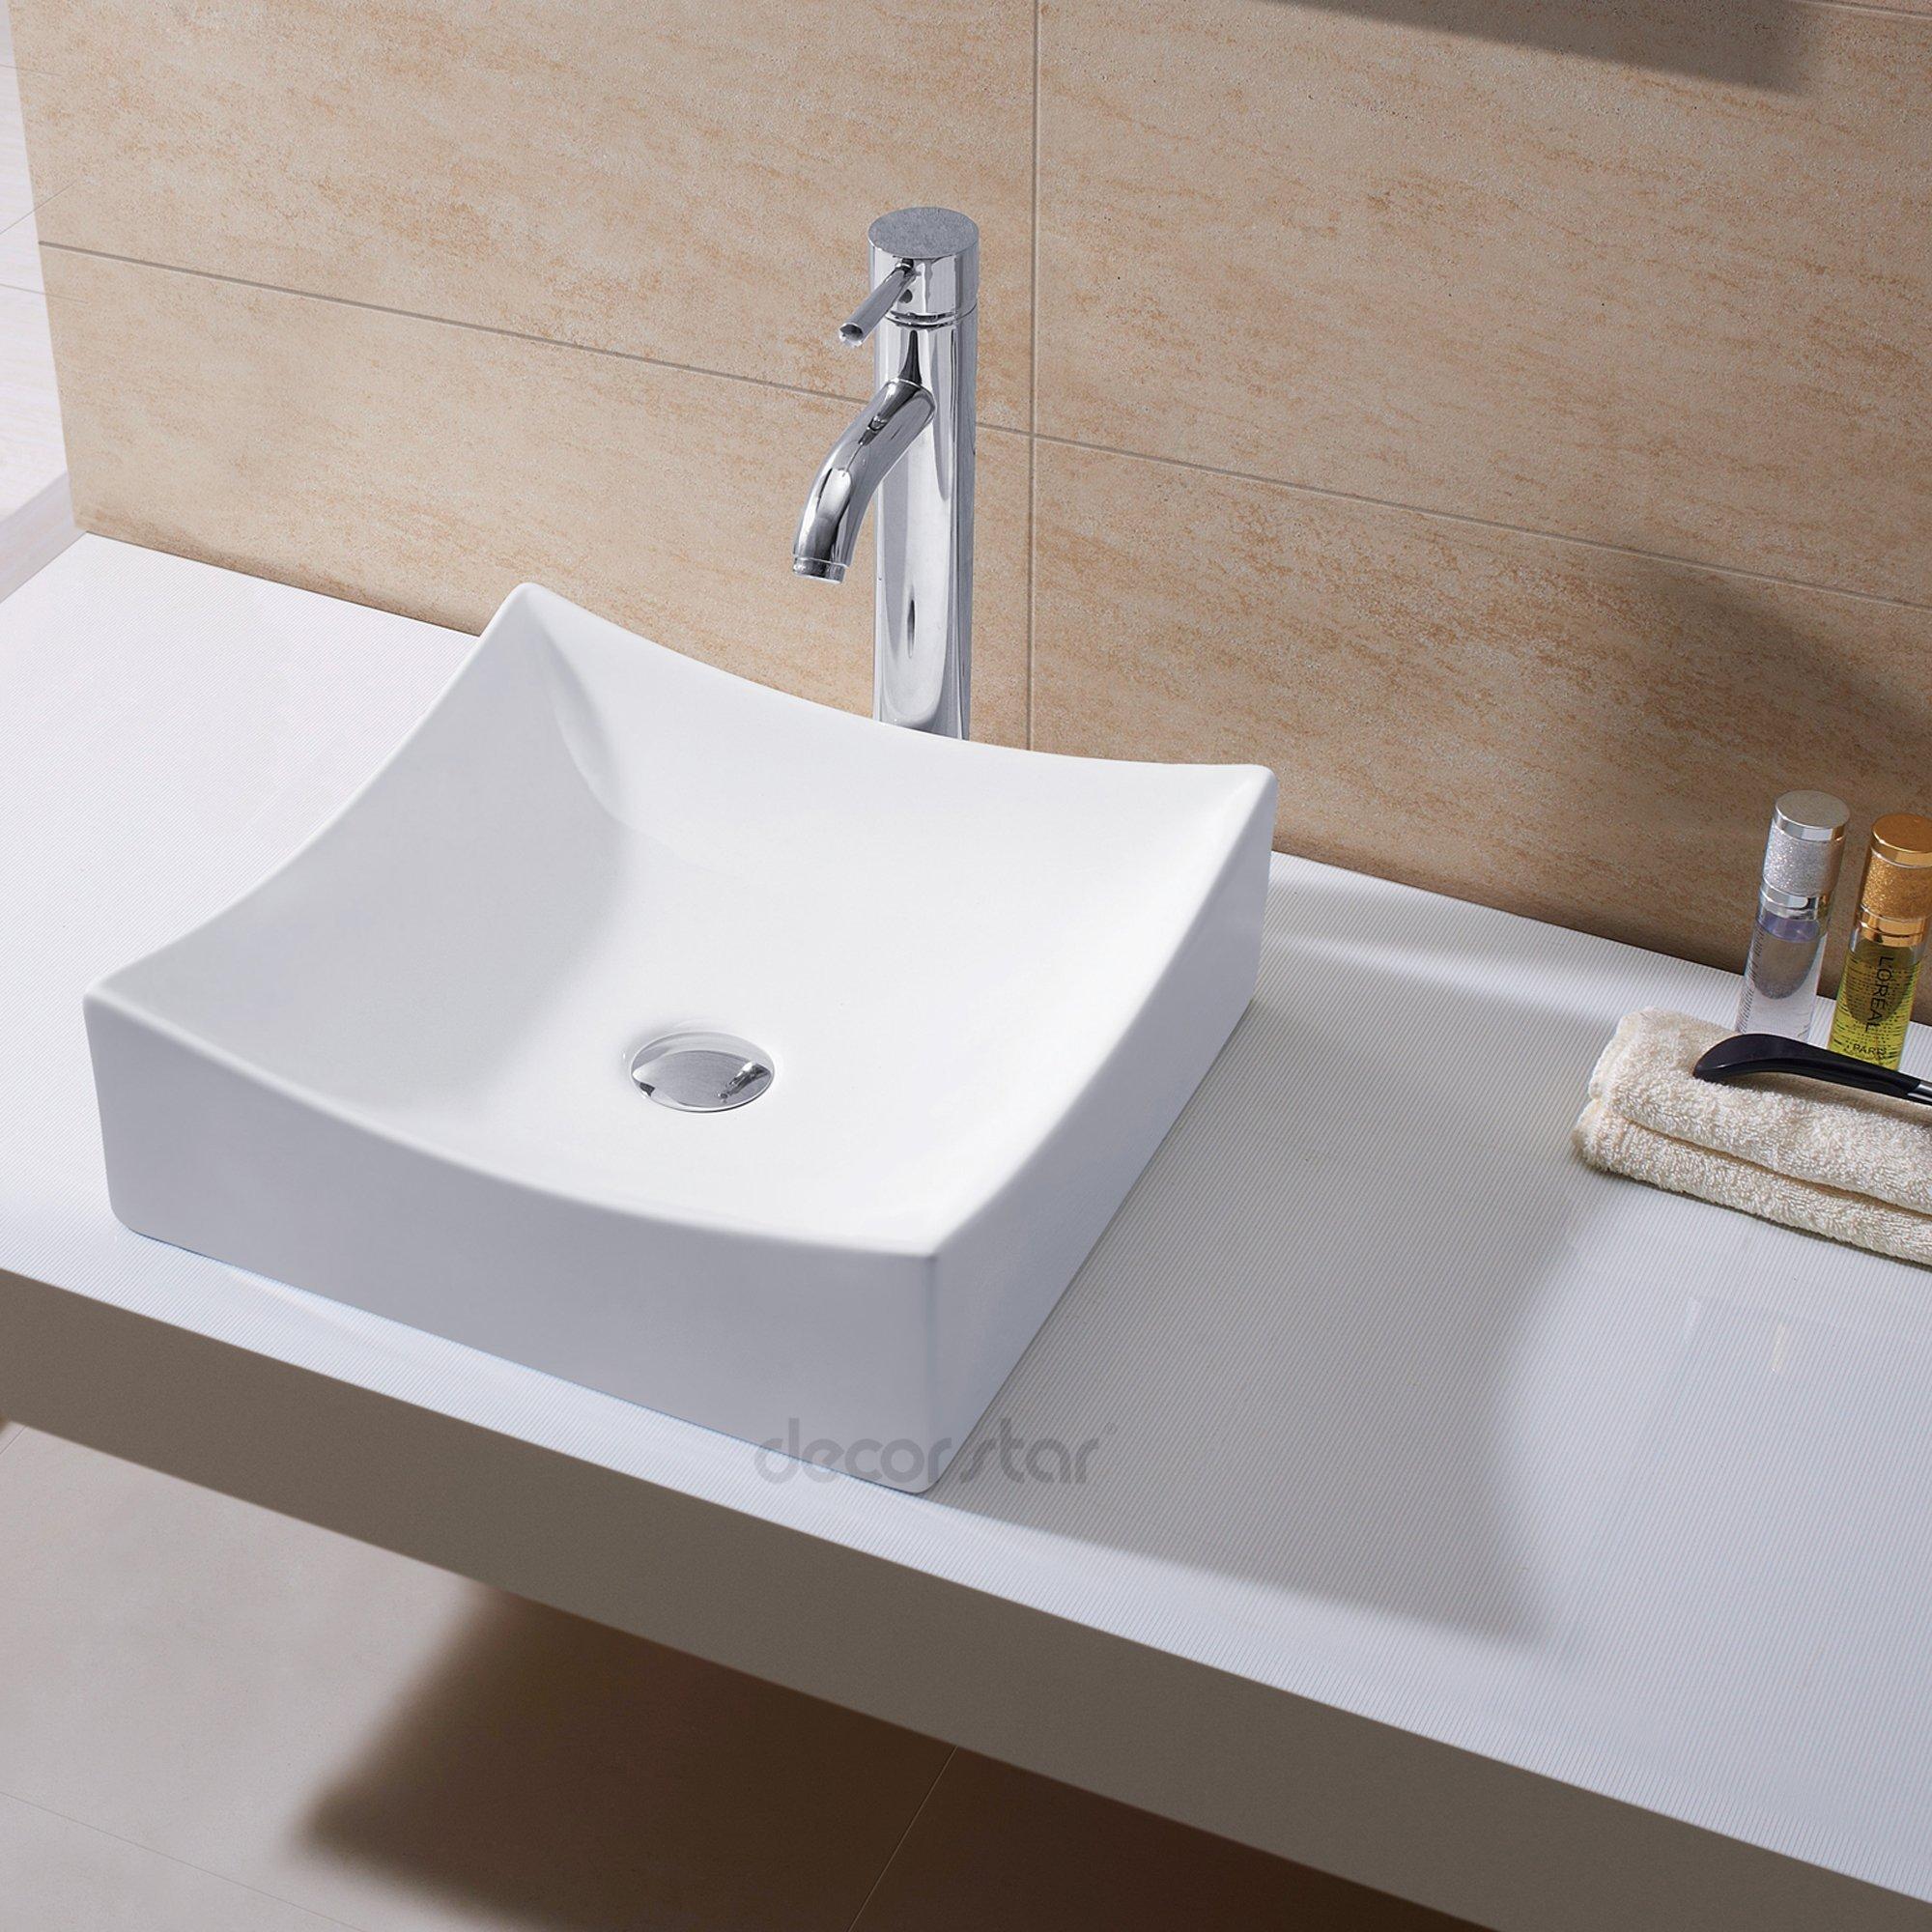 Decor Star CB-016 Bathroom Porcelain Ceramic Vessel Vanity Sink Art Basin